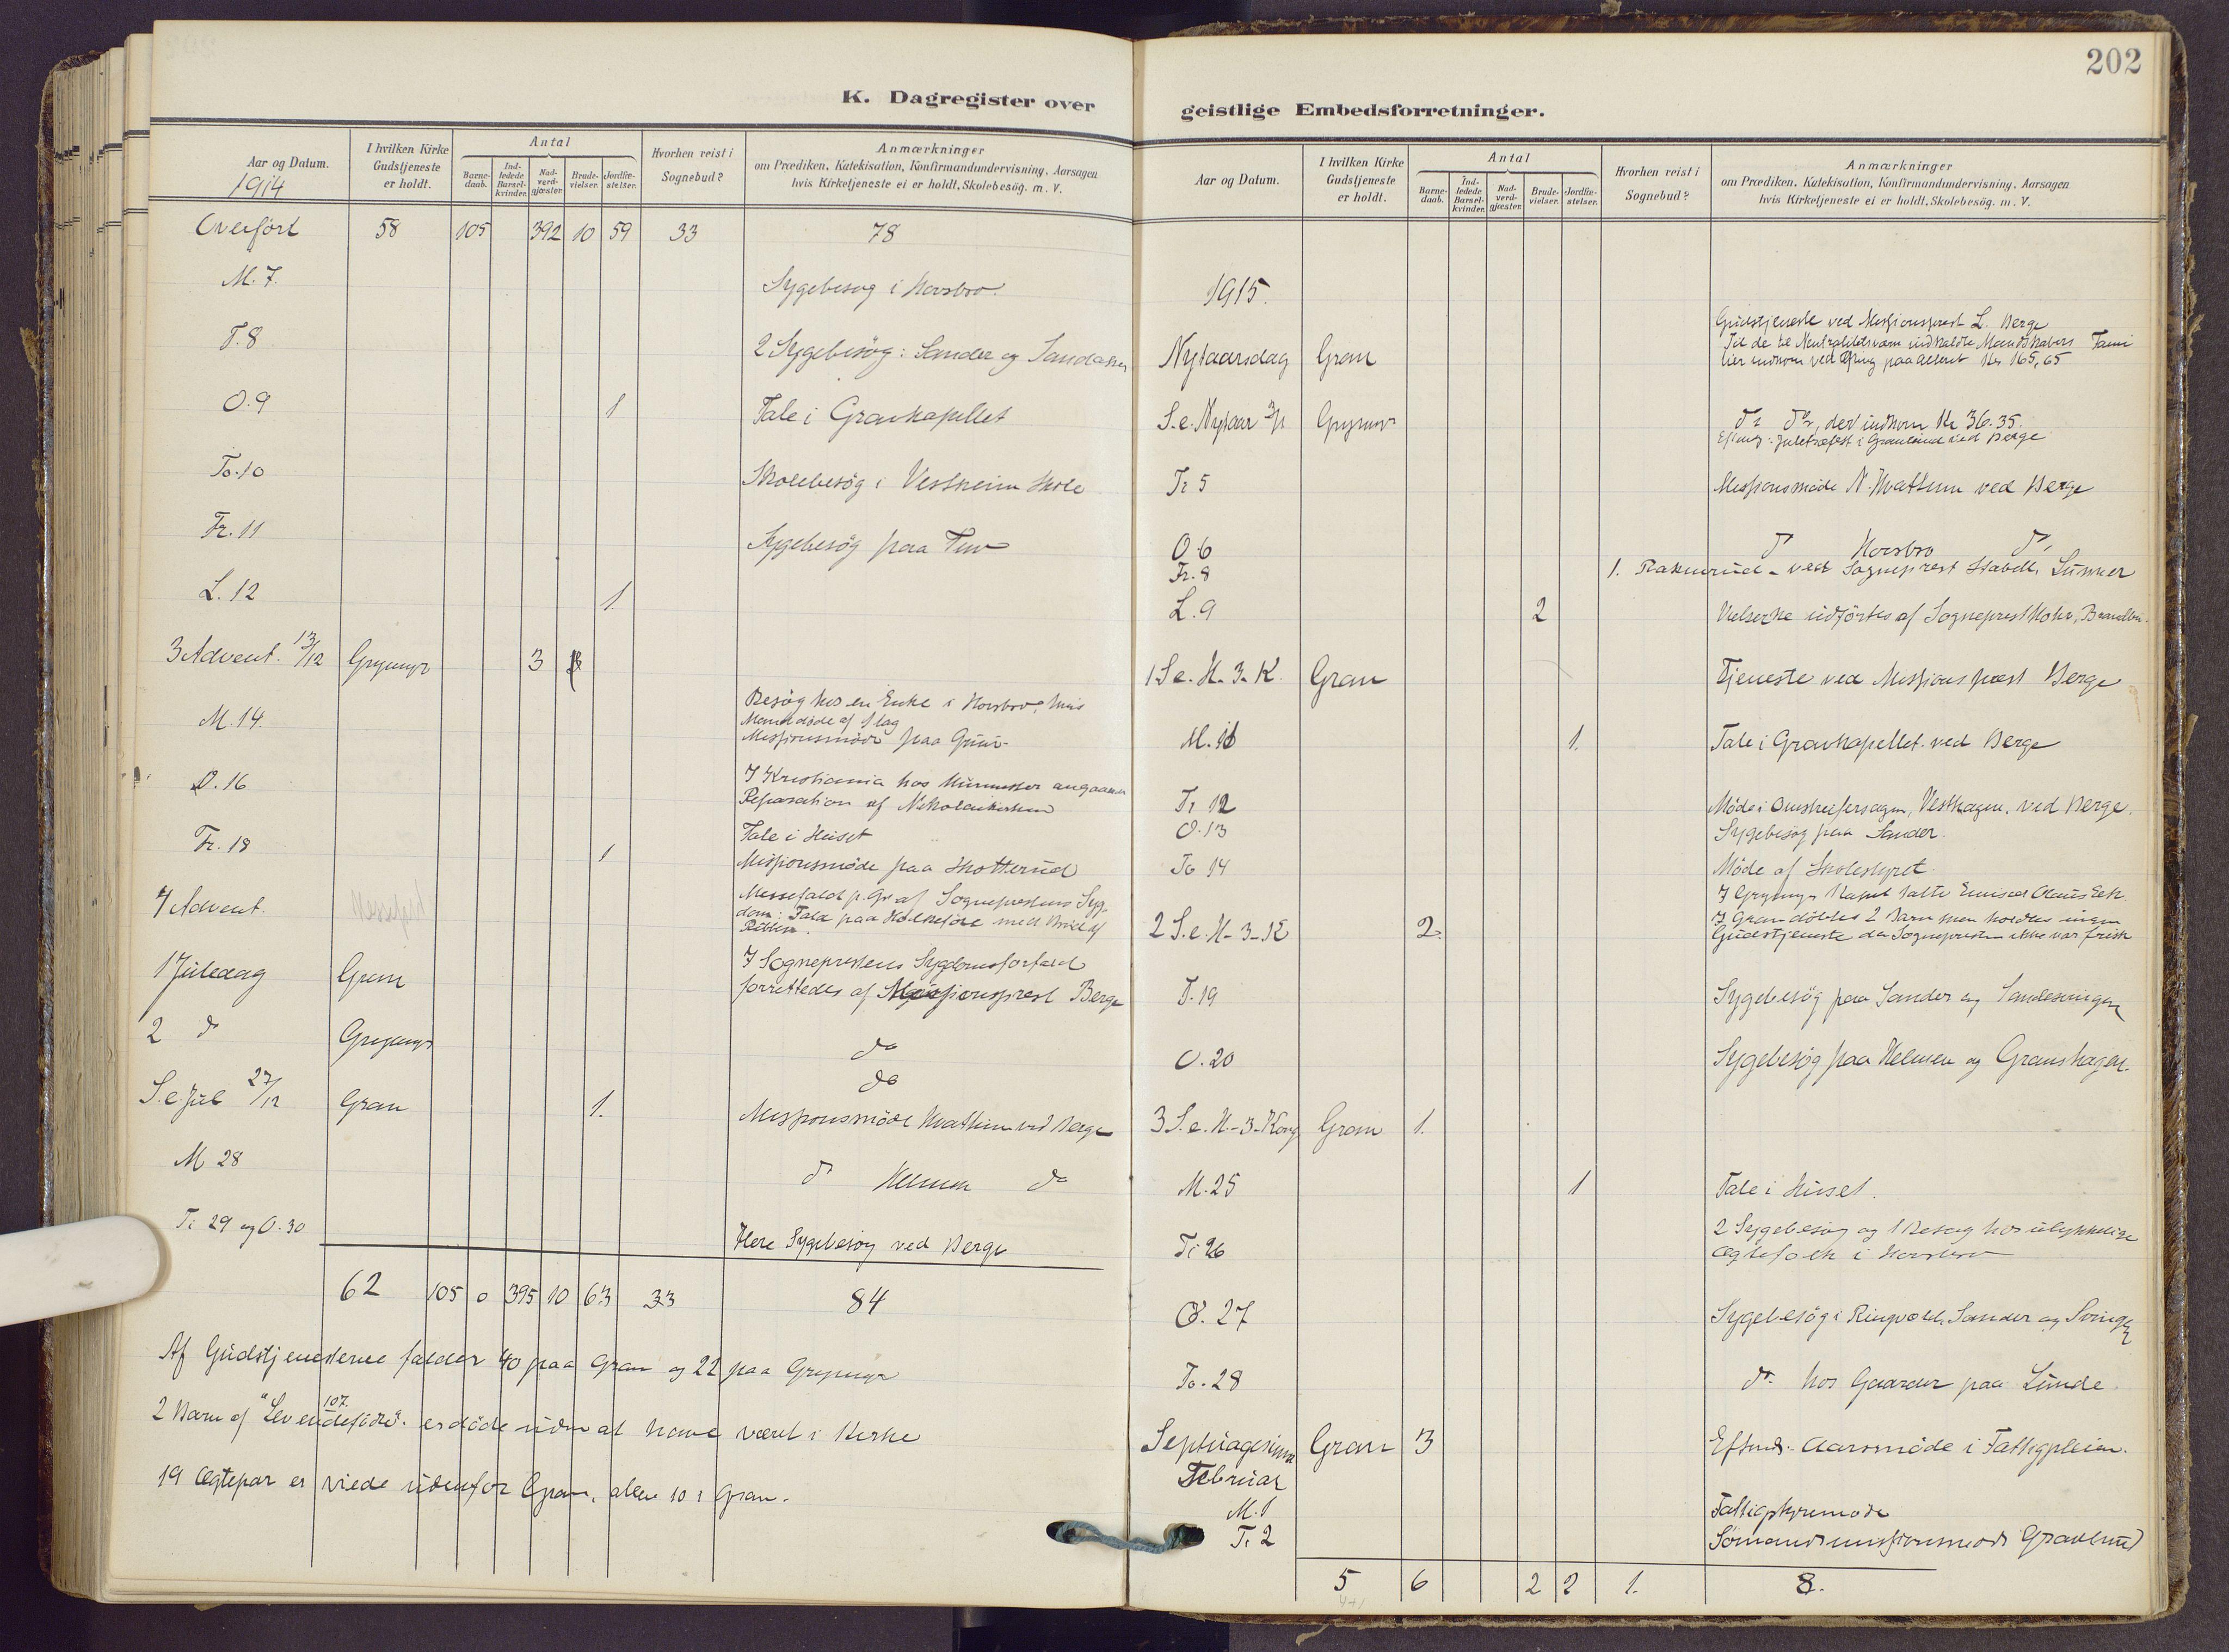 SAH, Gran prestekontor, Ministerialbok nr. 22, 1908-1918, s. 202